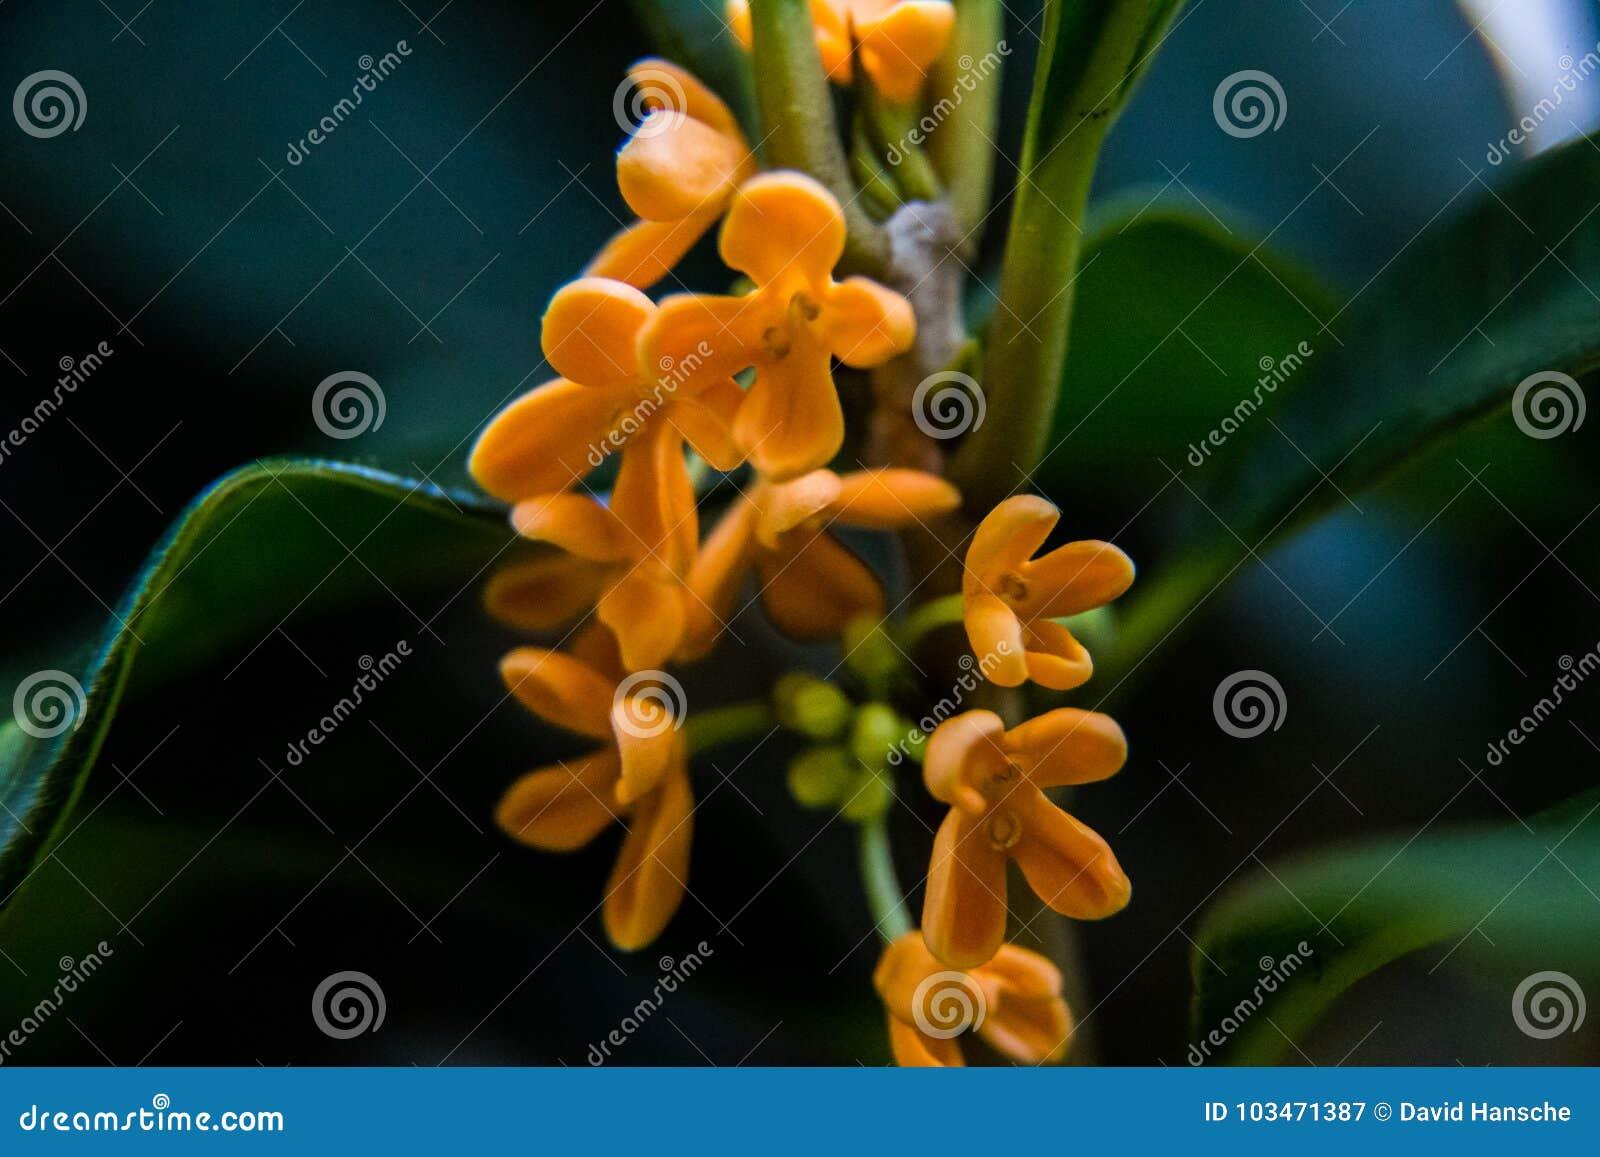 b65ec7f63 A macro shot of small orange Kinmokusei flowers blooming within a green,  broad-leaved bush.